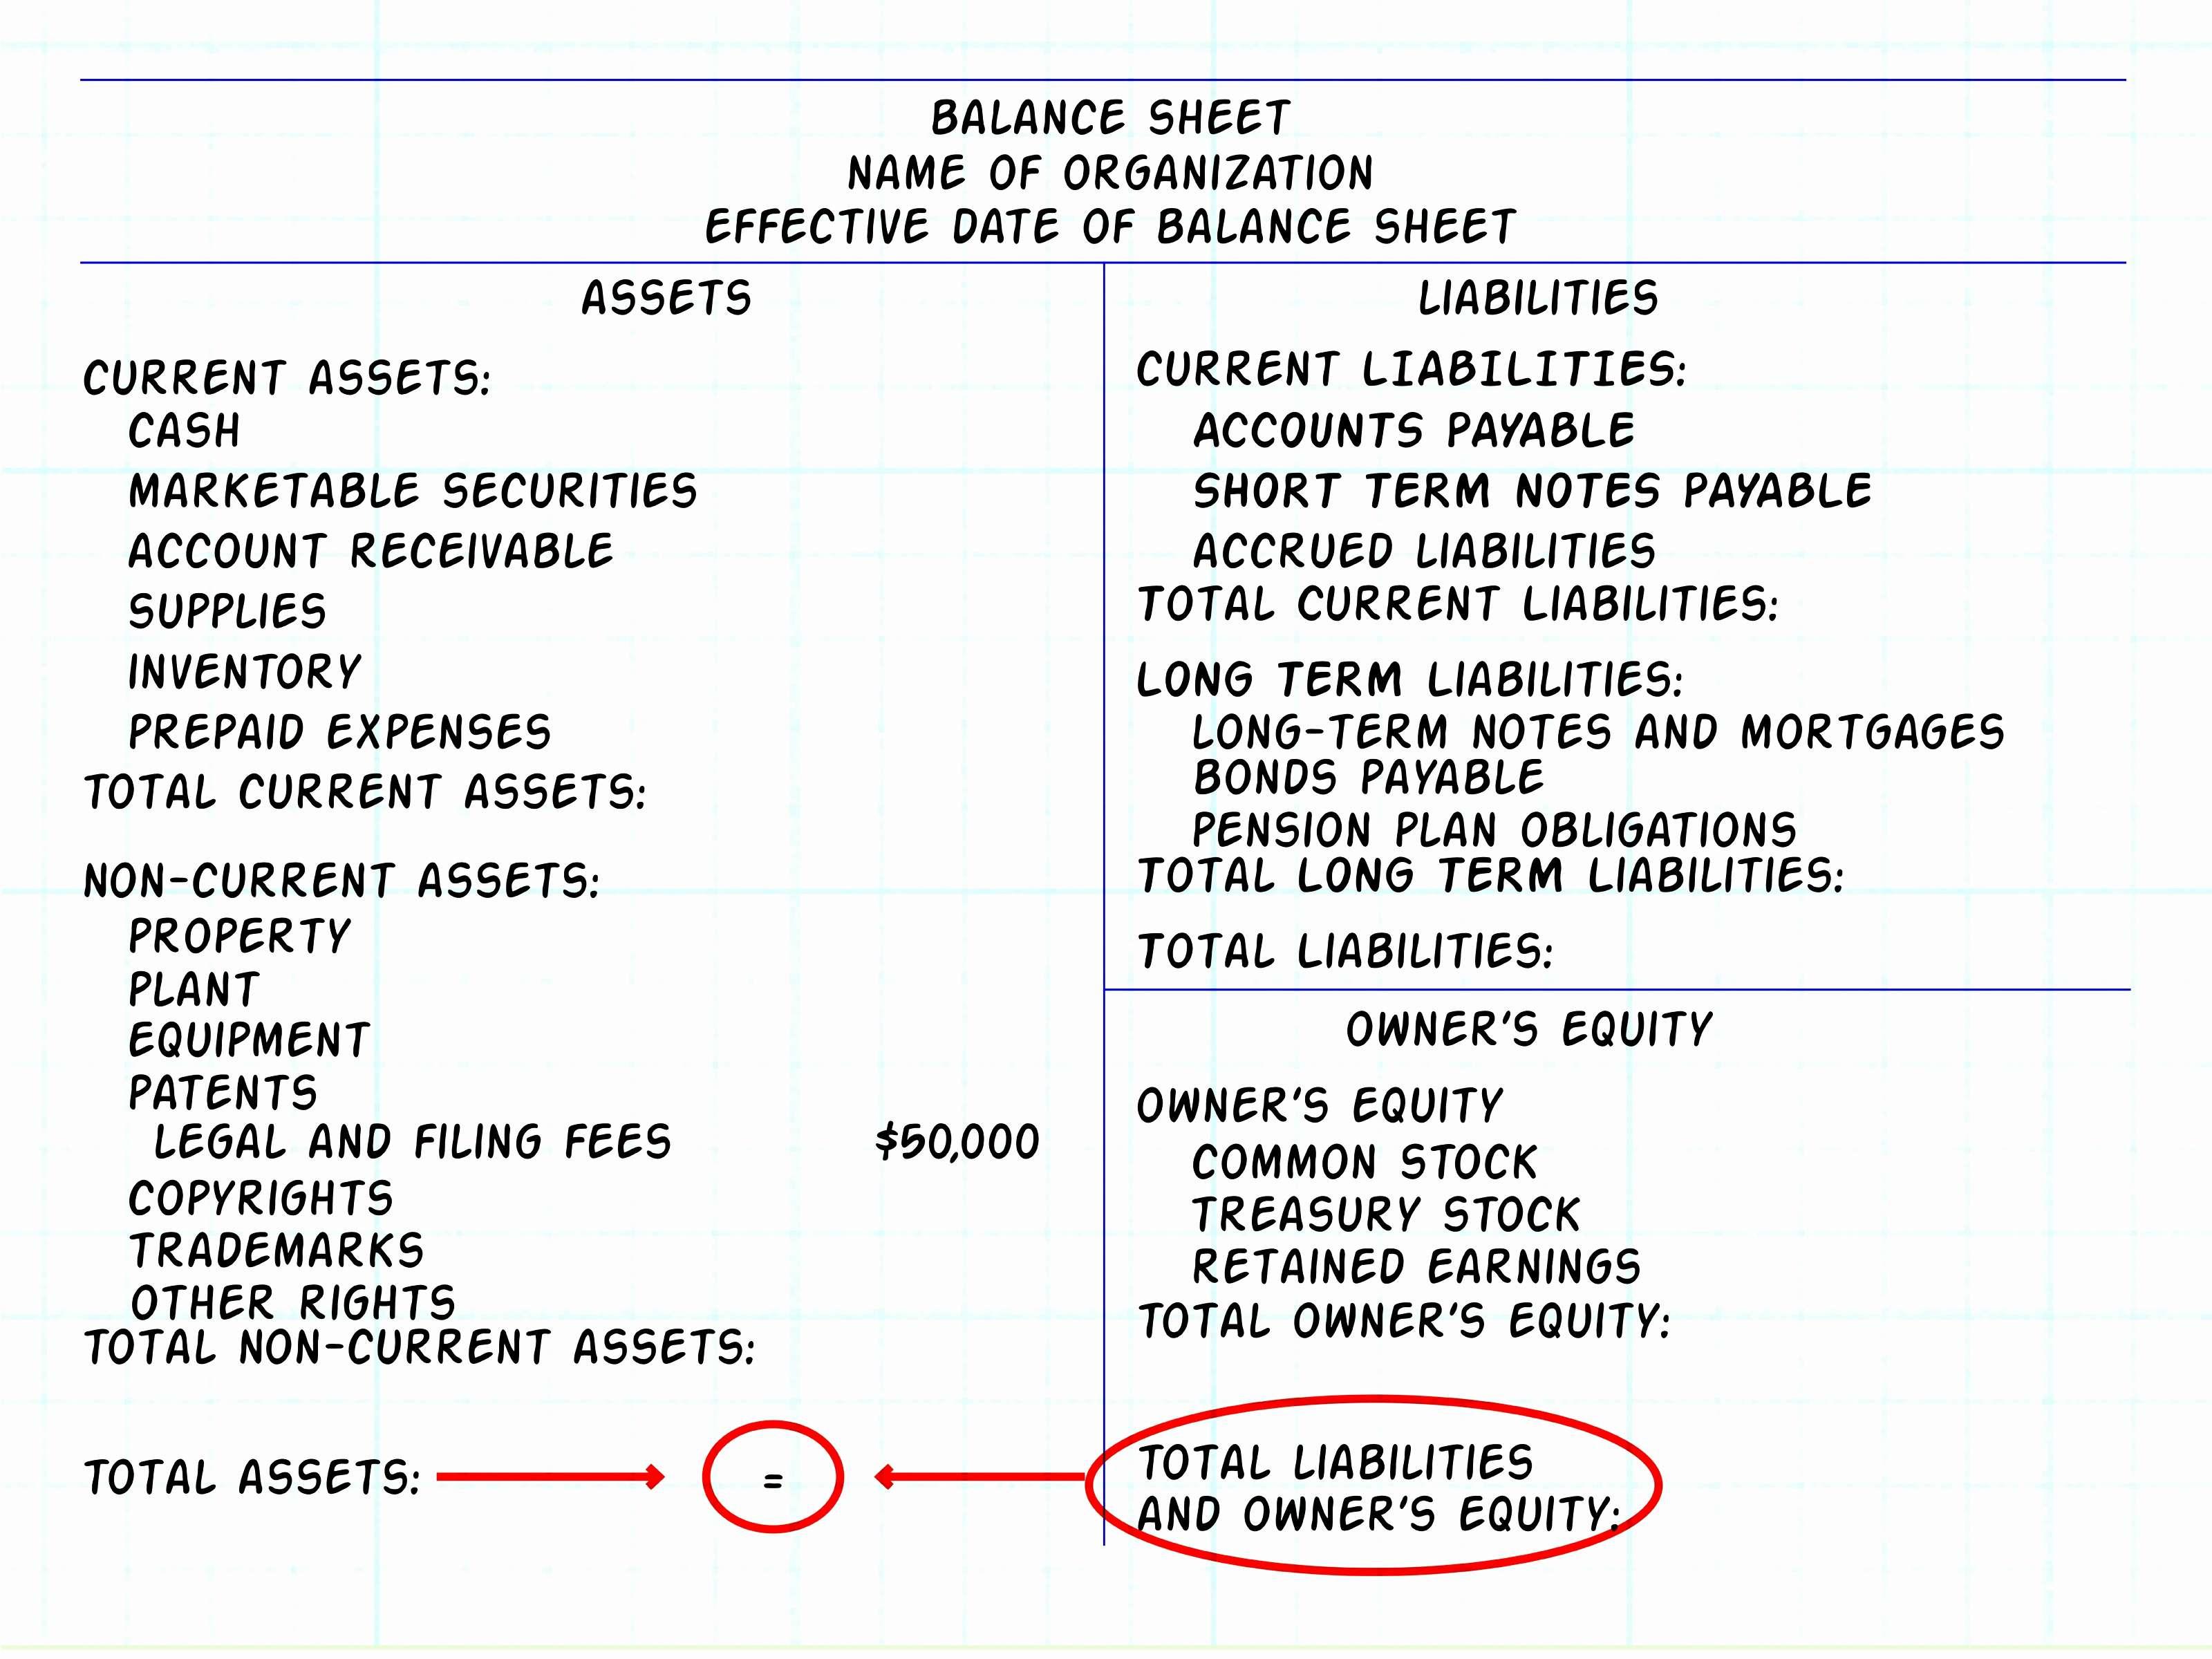 Nist 800 53 Rev 4 Excel Spreadsheet Inside Nist 800 53 Rev 4 Spreadsheet  Readleaf